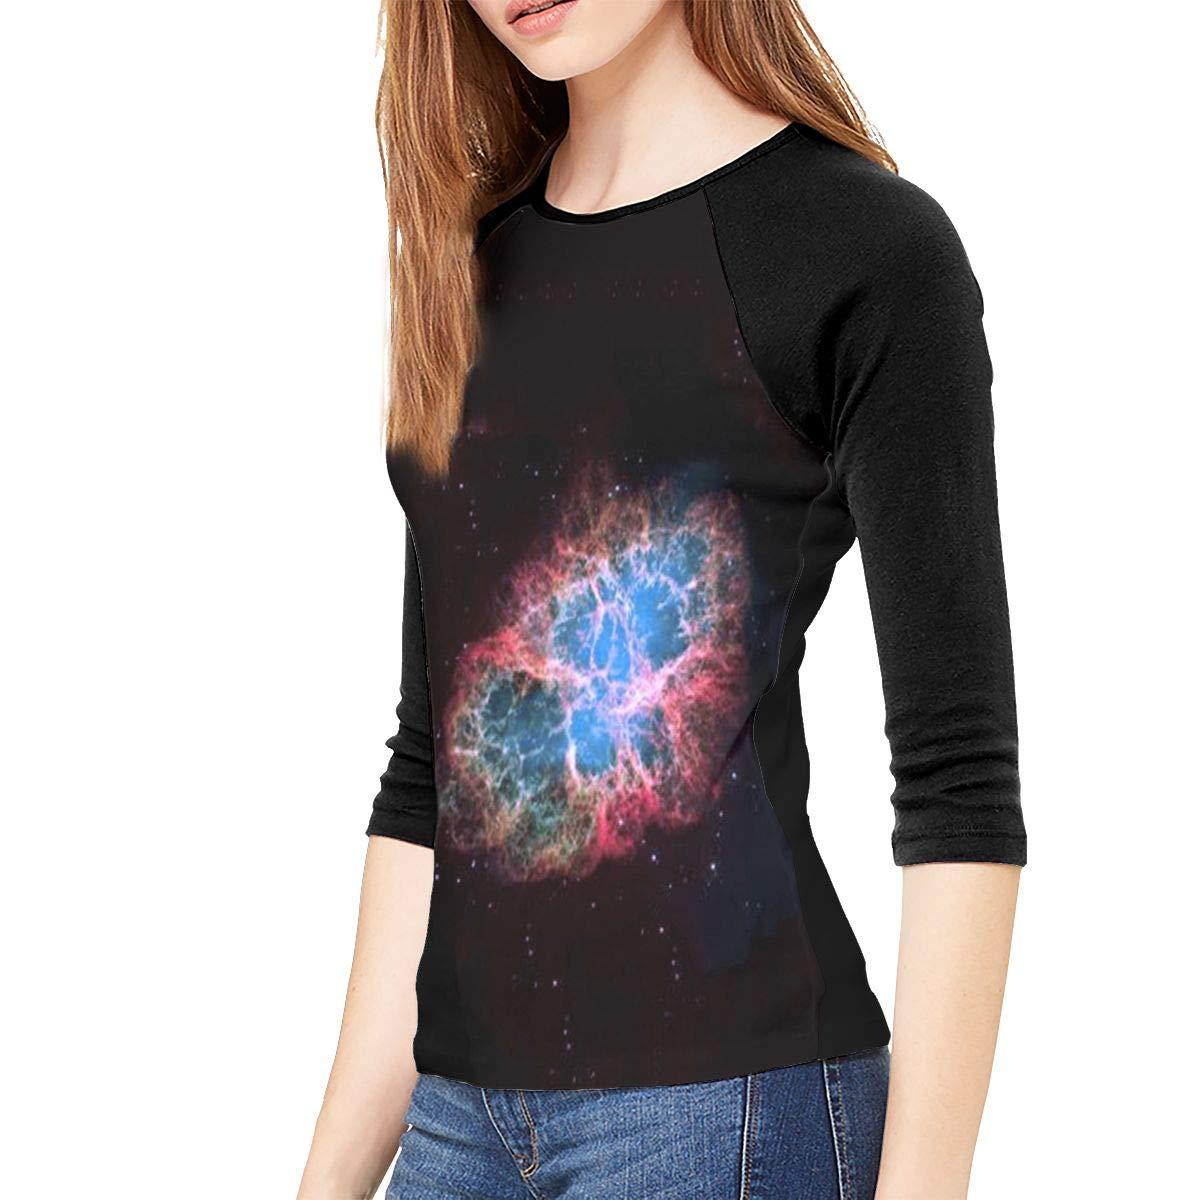 SHDFhgHGF Amazing Galaxy Womens 3//4 Sleeve Casual Scoop Neck Tops Tee